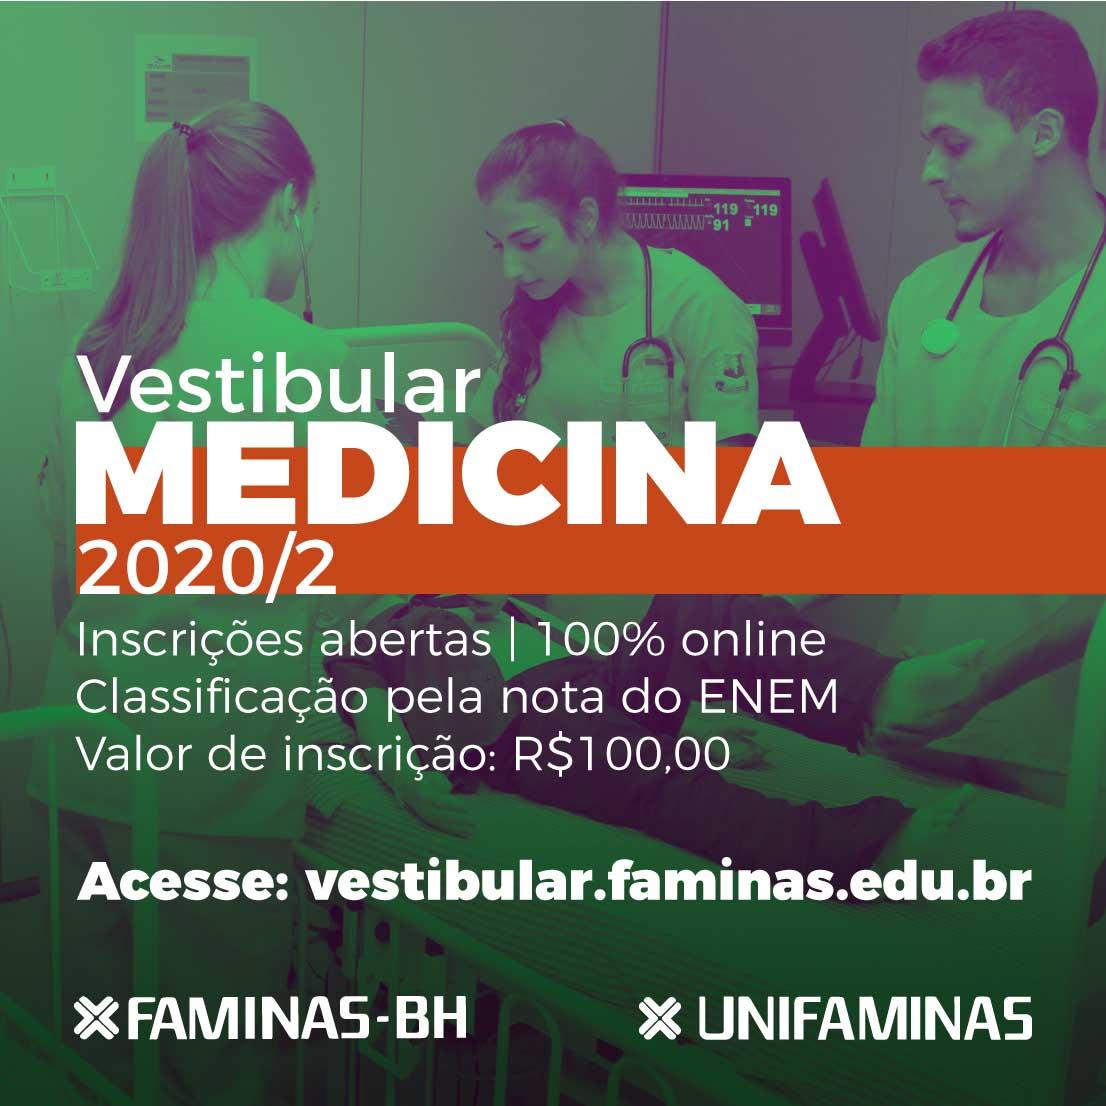 Vestibular de Medicina FAMINAS 2020/2